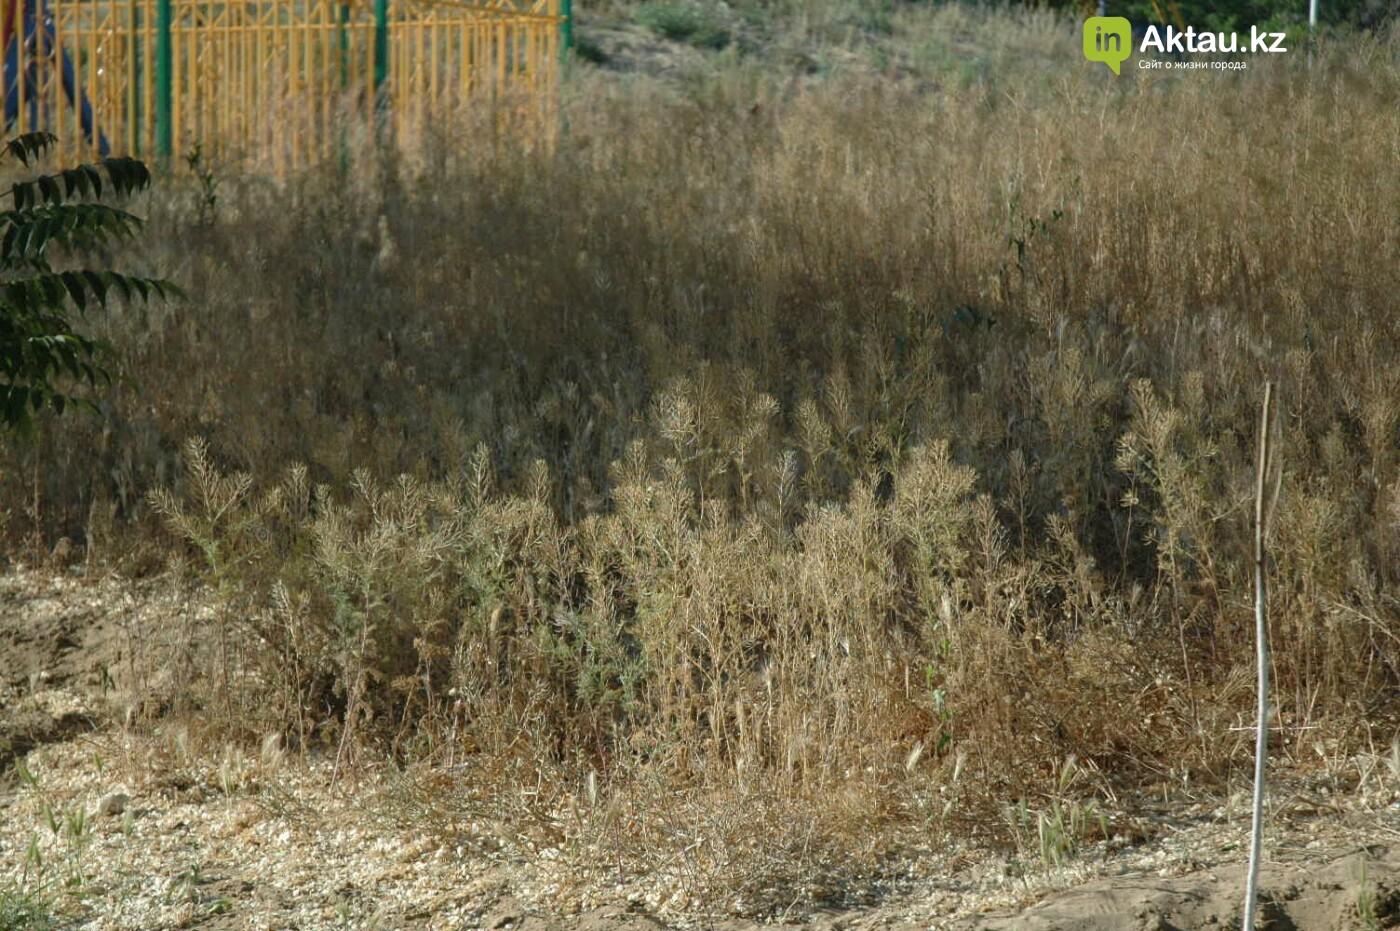 Погибшие от засухи и обезвоживания в Актау исчисляются десятками (ФОТО), фото-49